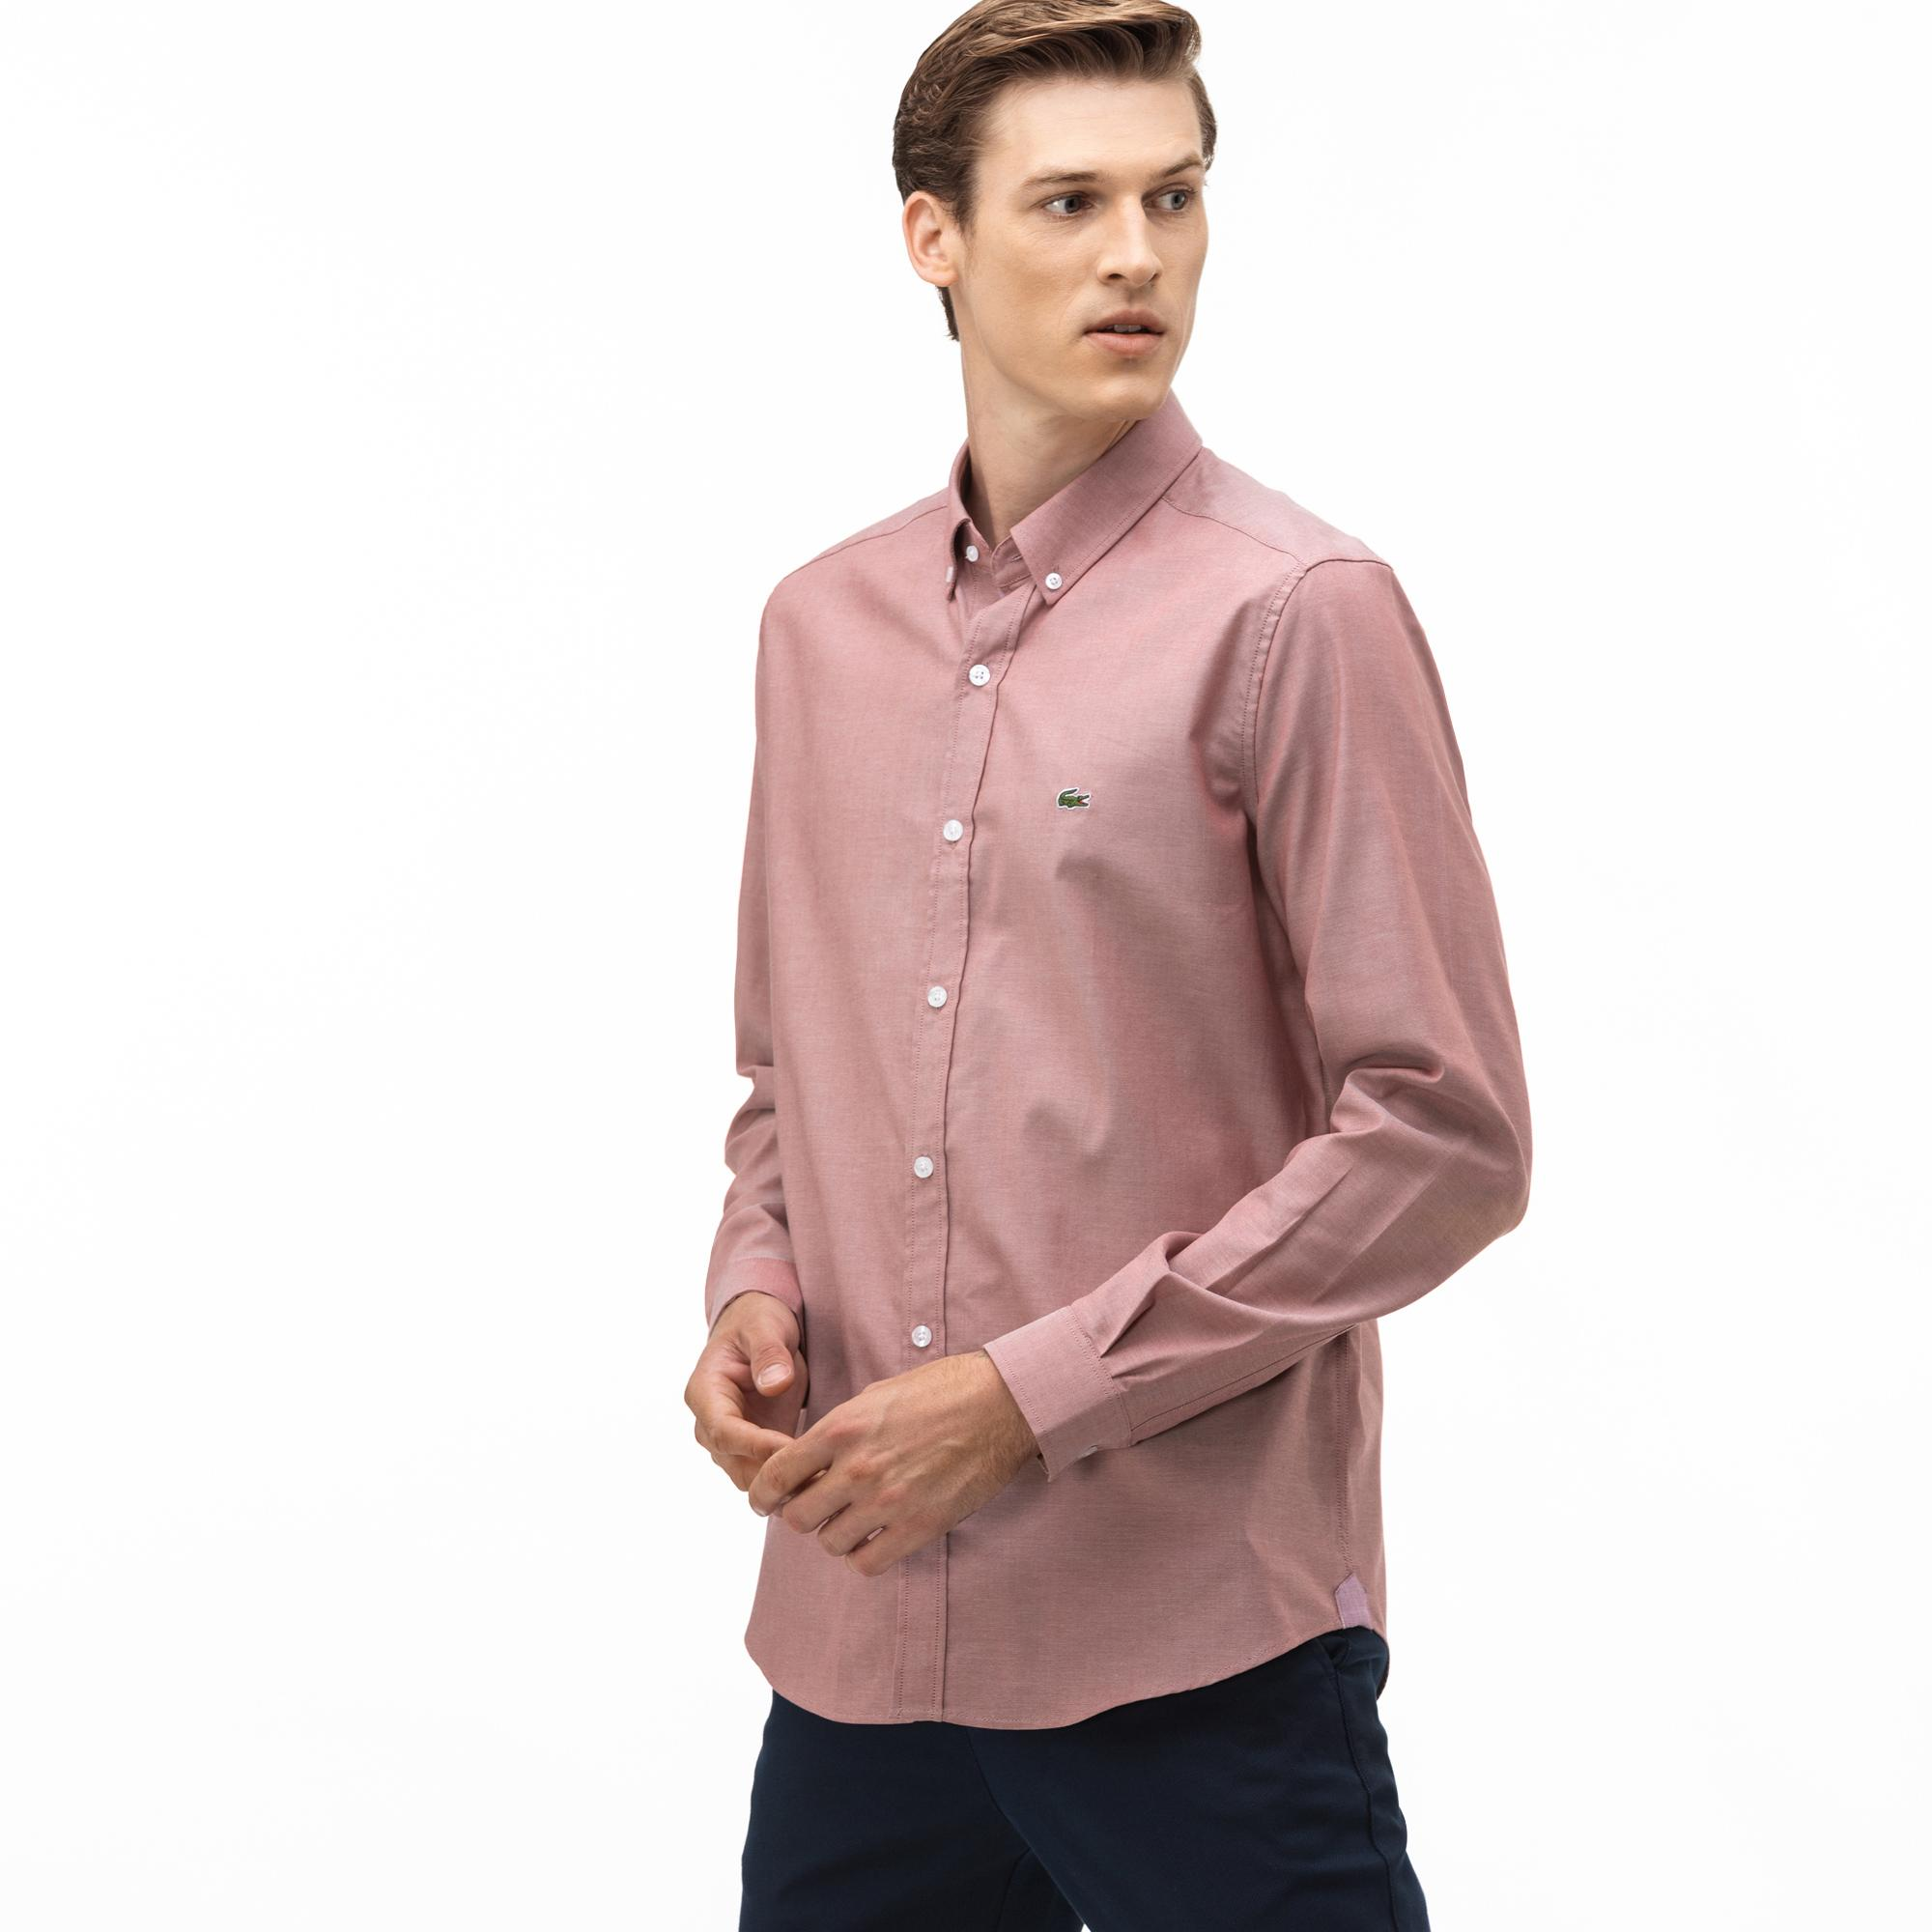 Lacoste Erkek Regular Fit Pembe Gömlek